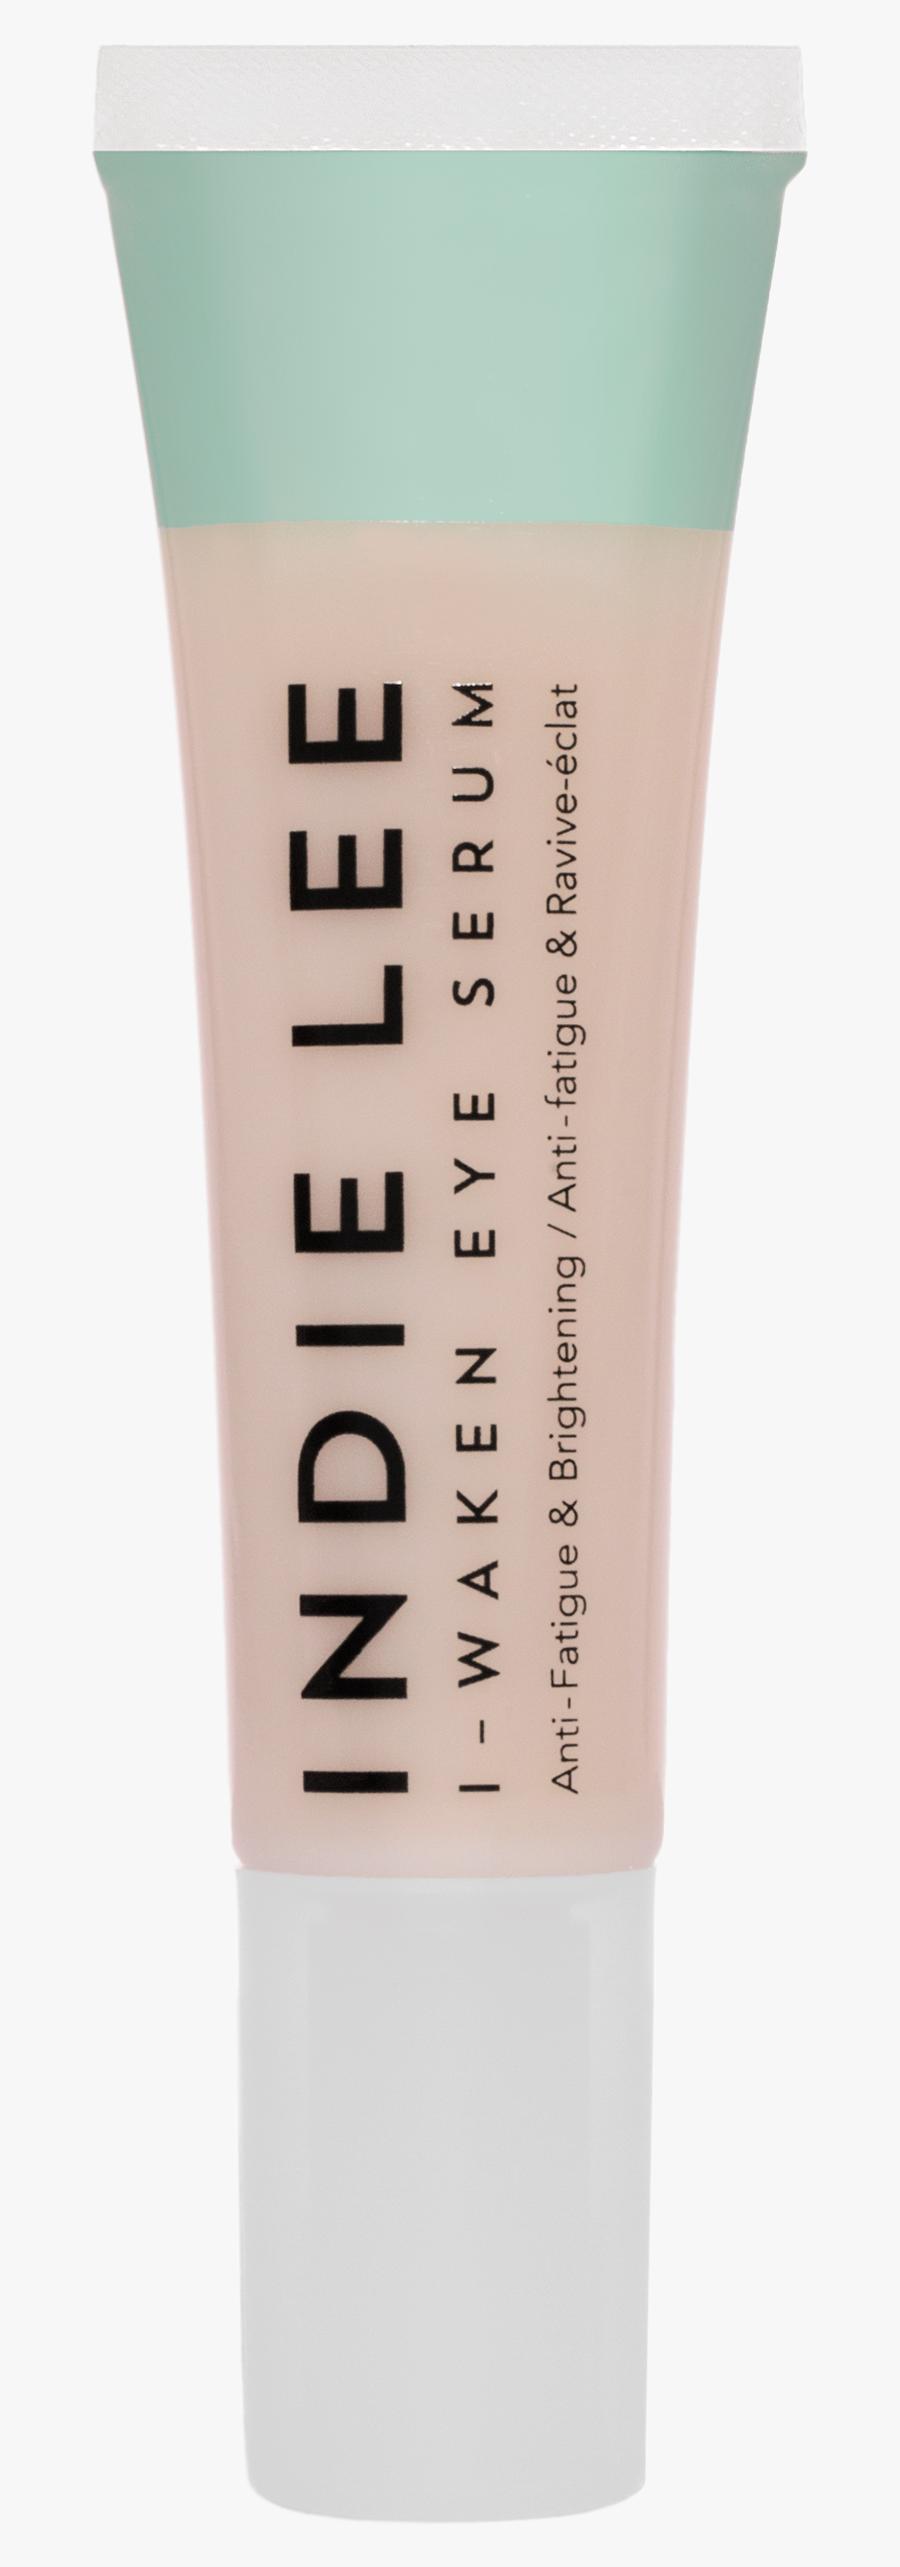 Cosmetics, Transparent Clipart